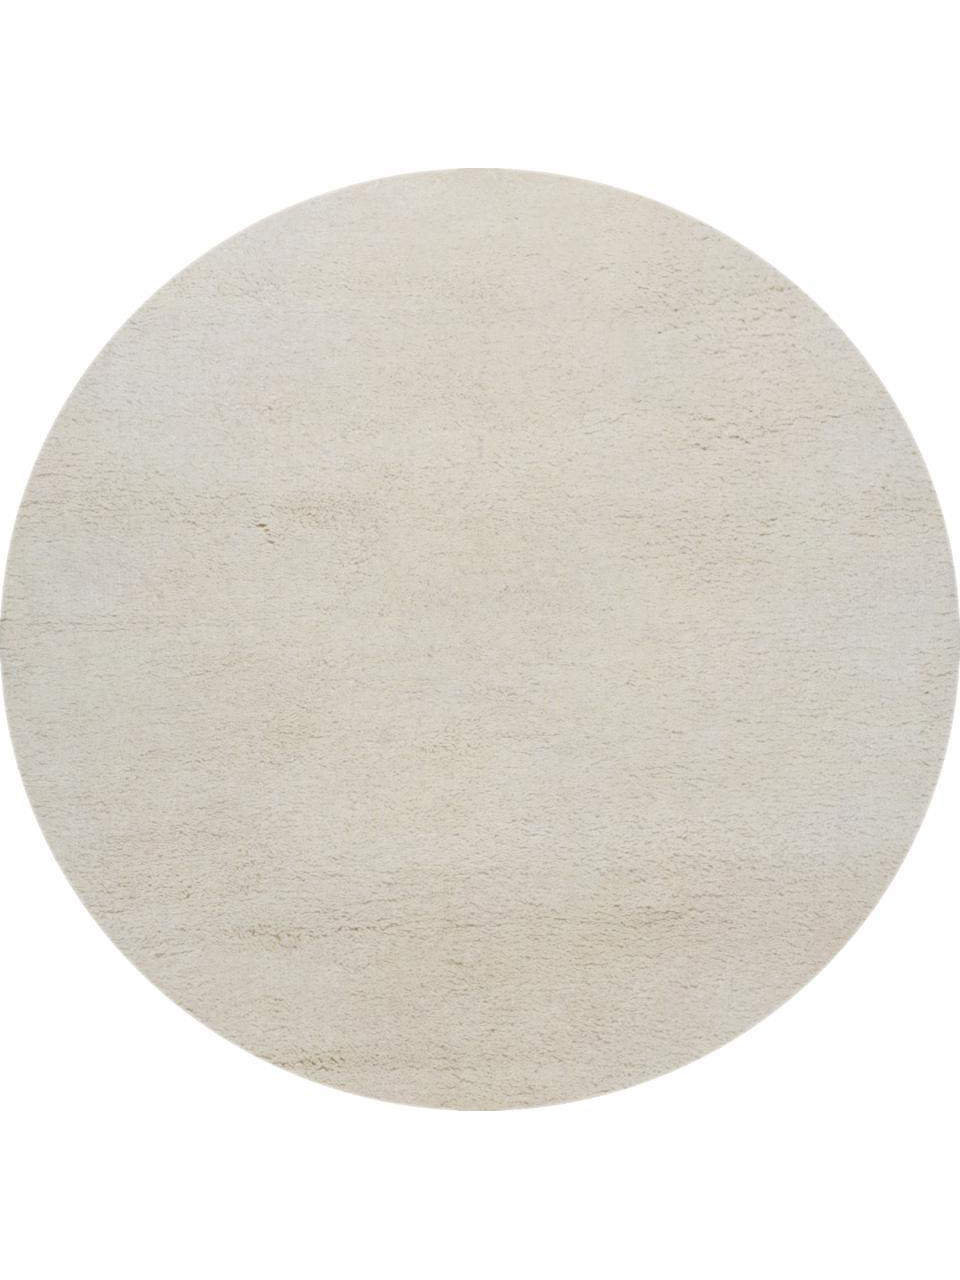 berb re double blanc tapis berb res n 1773 150x150cm. Black Bedroom Furniture Sets. Home Design Ideas